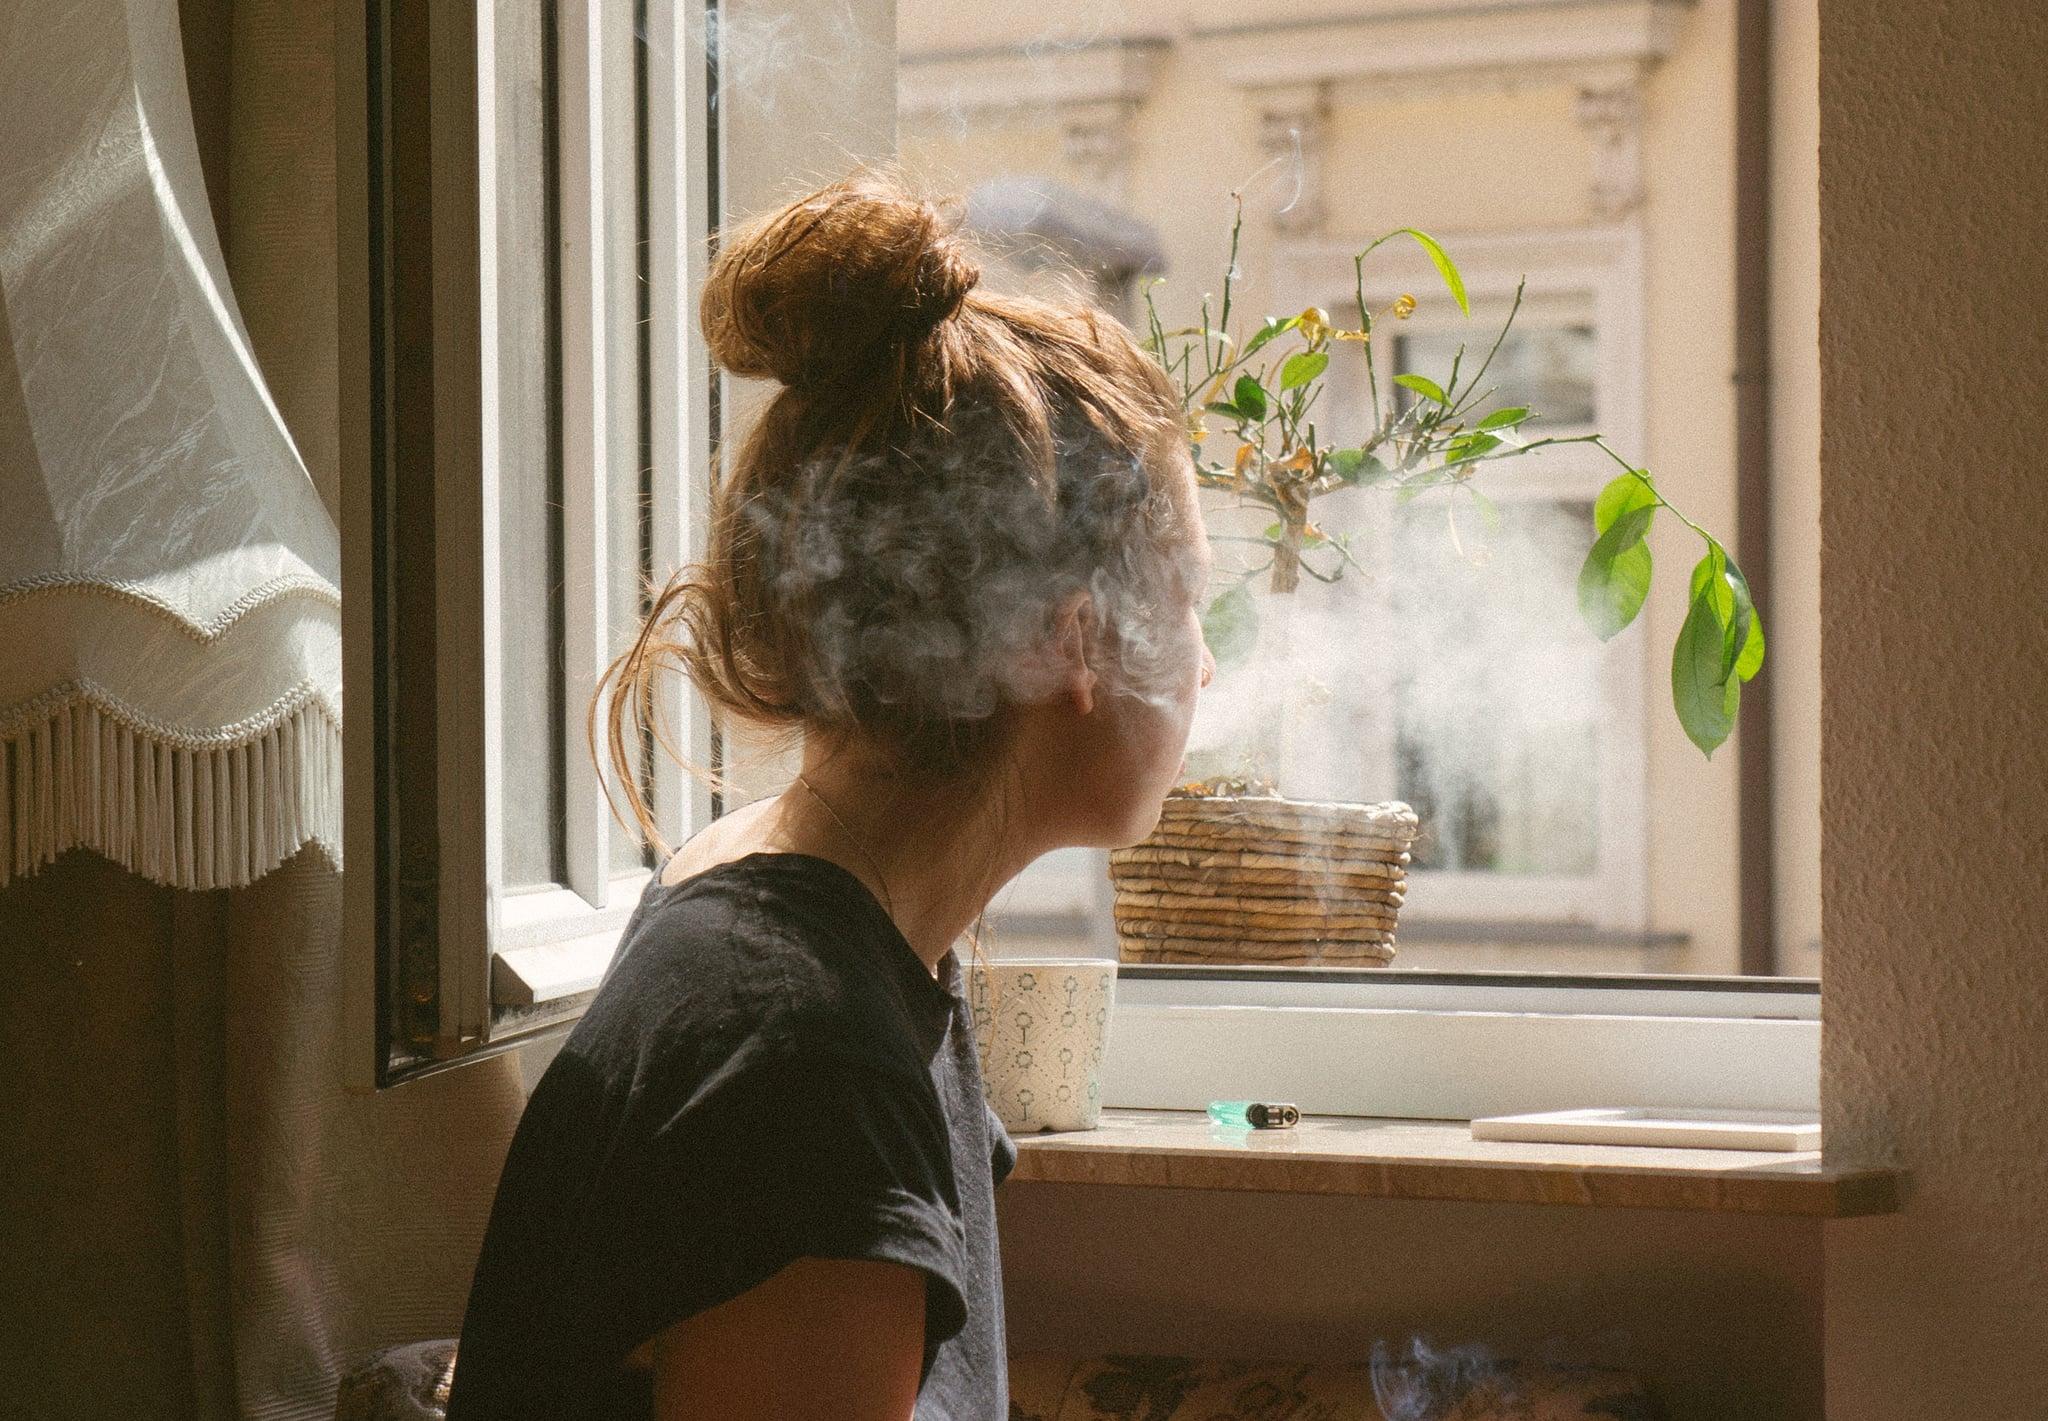 Is Marijuana Addictive? A Neuroscientist Sets the Record Straight